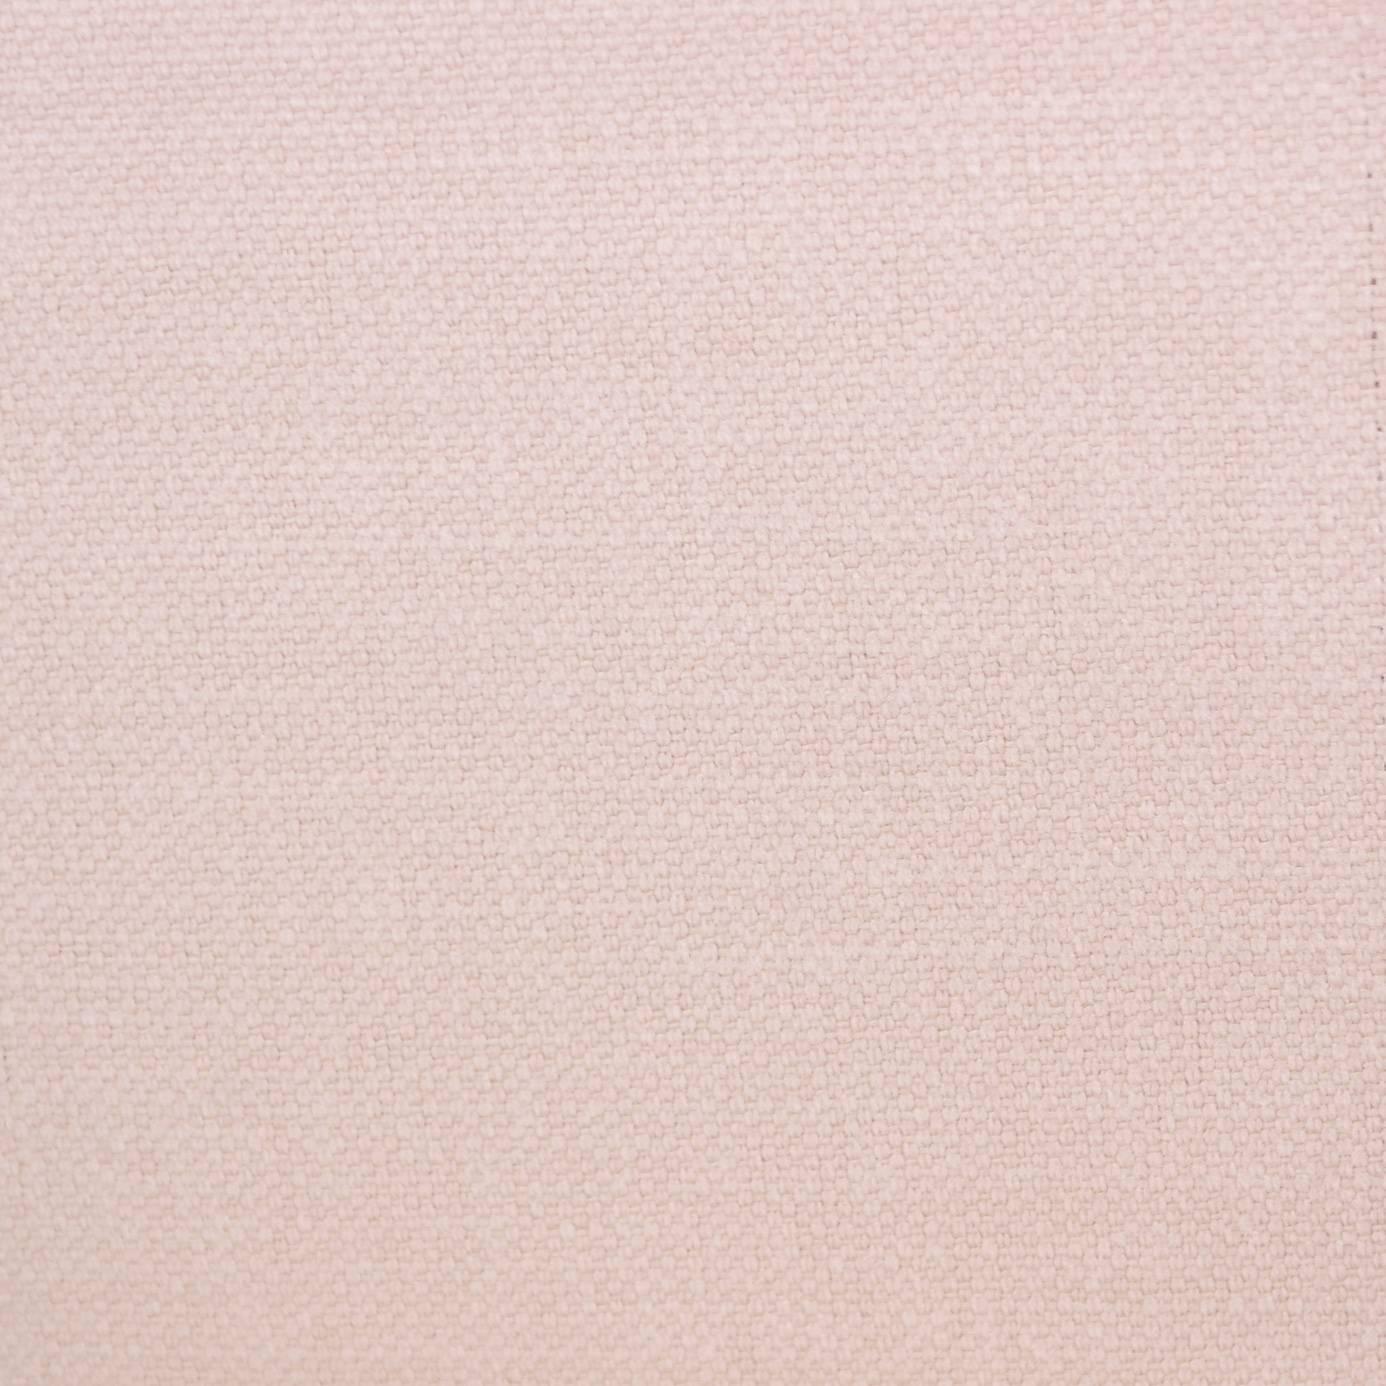 Linara Fabric Rose Quartz 2494 376 Romo Cubis